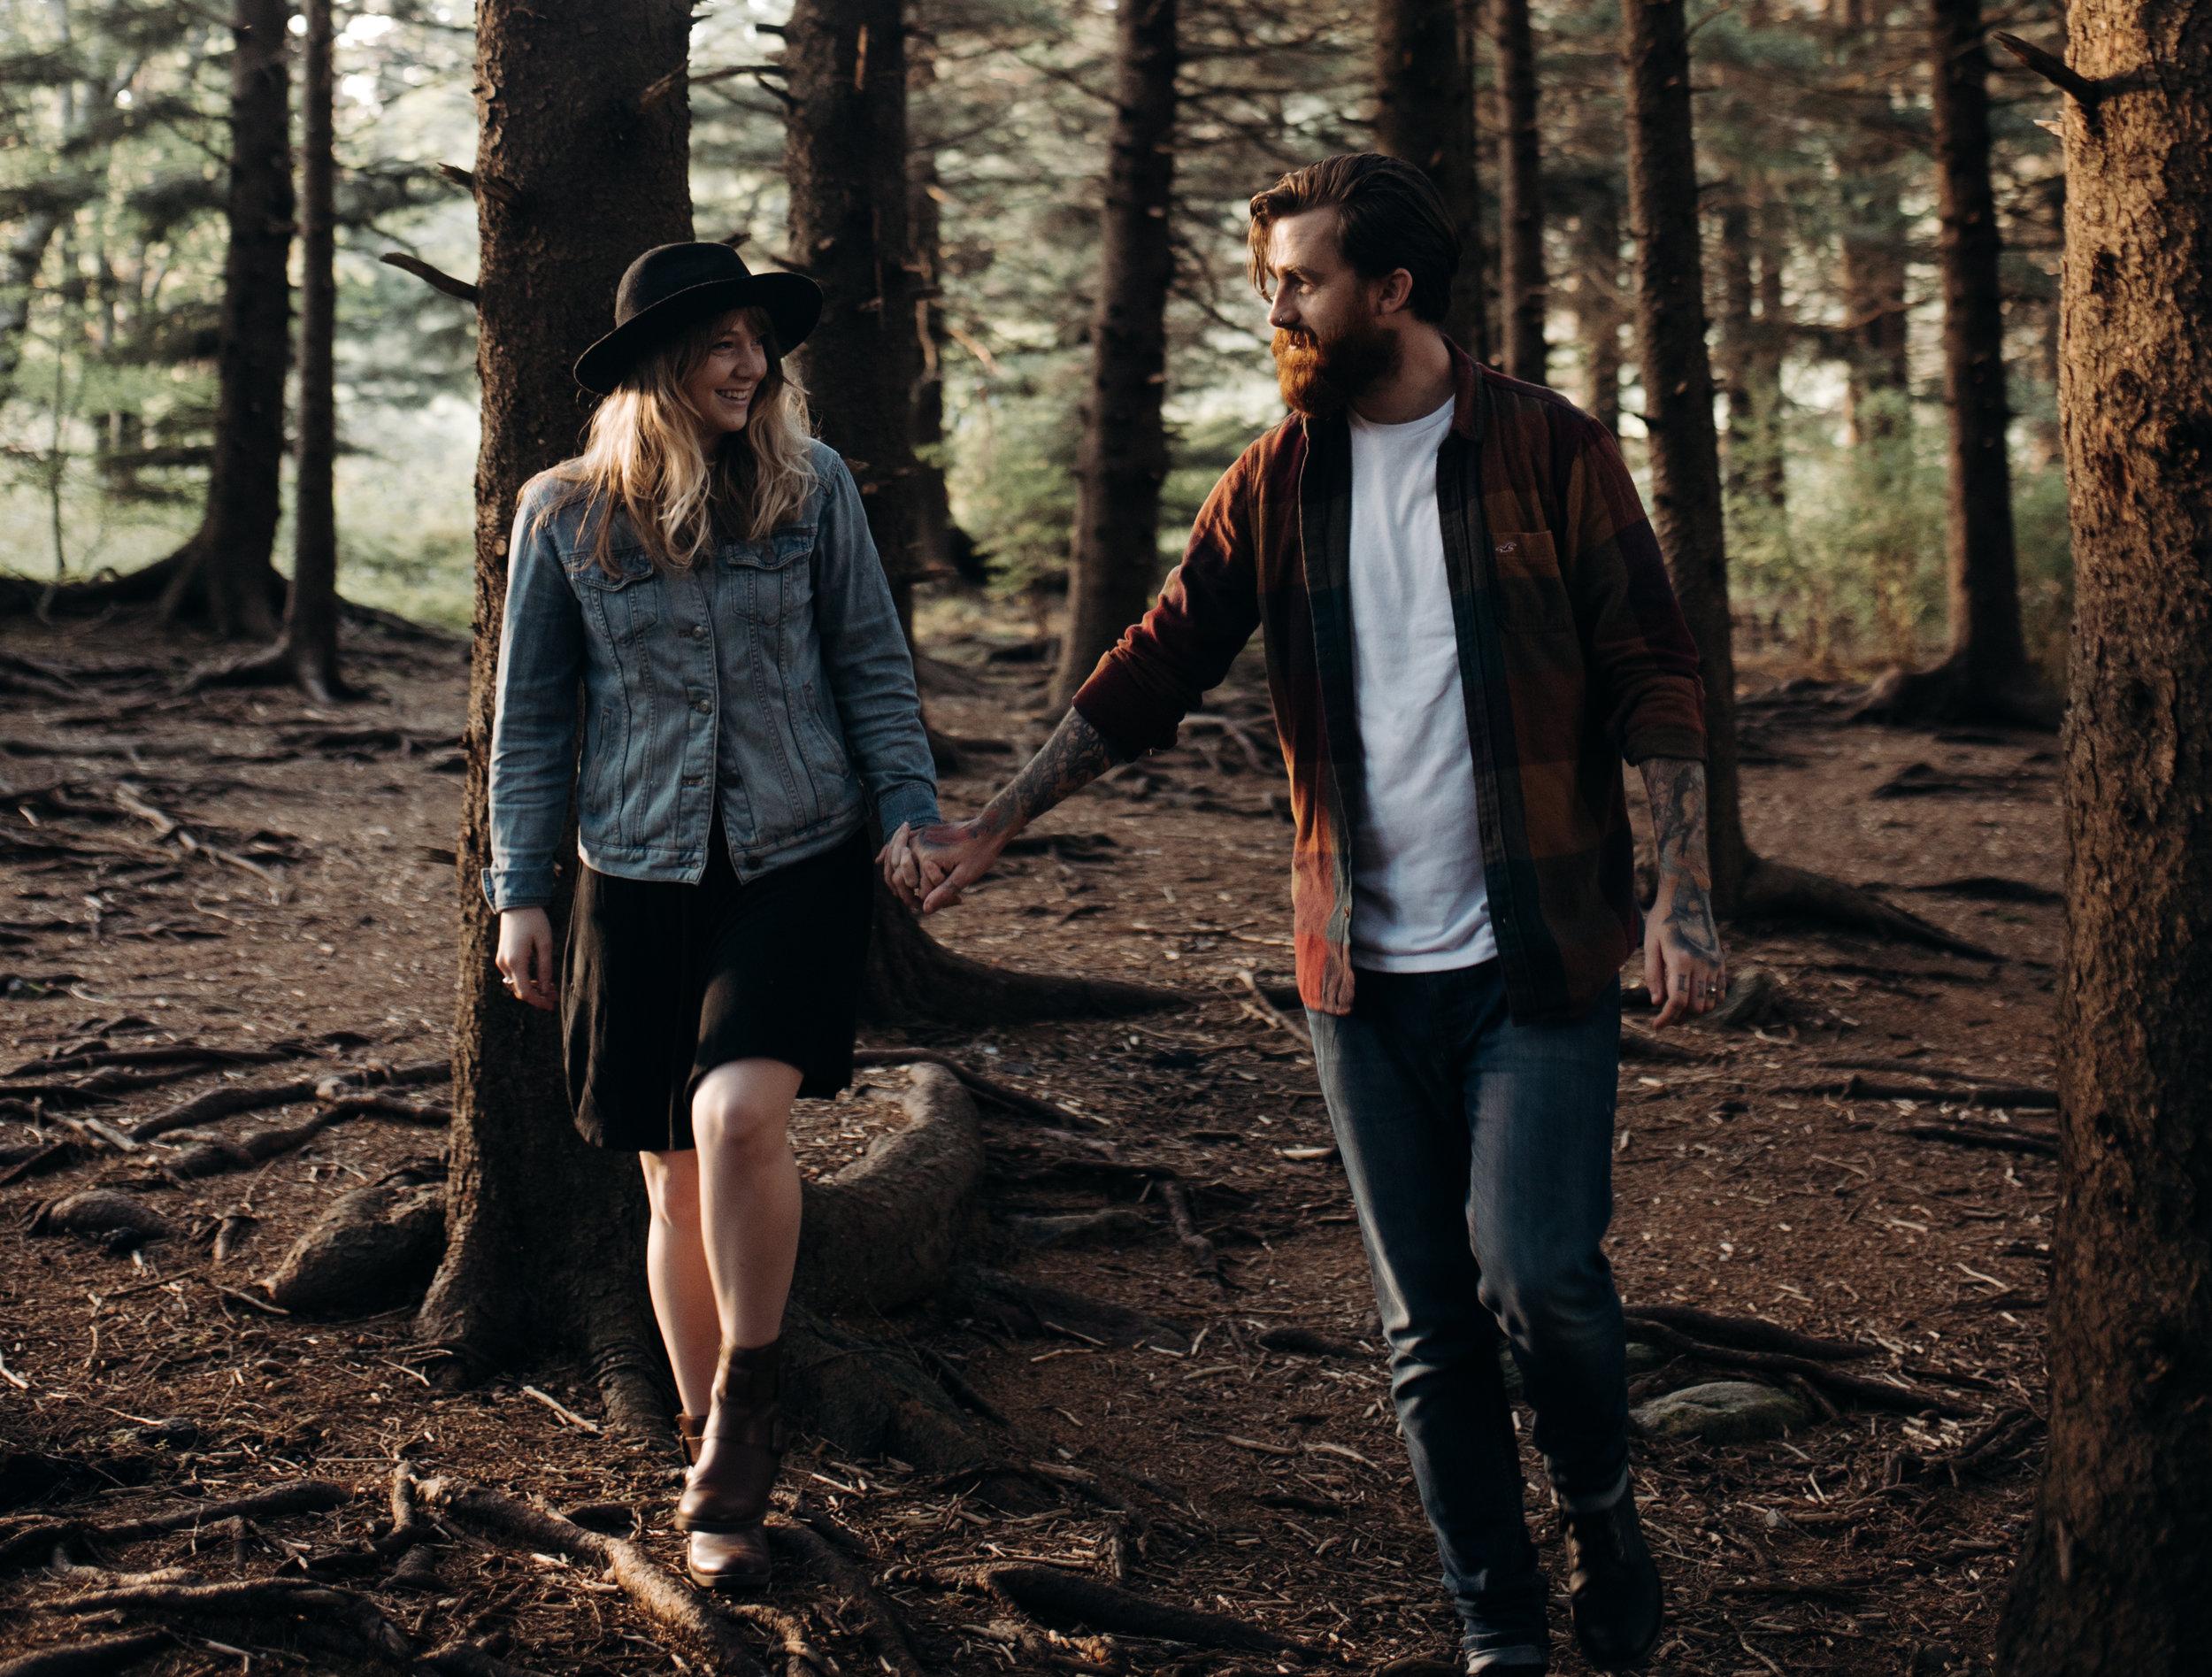 leah-joe-middleton-asheville-north-carolina-couple-session-destination-elopement-photographer-fox-and-film-50.jpg